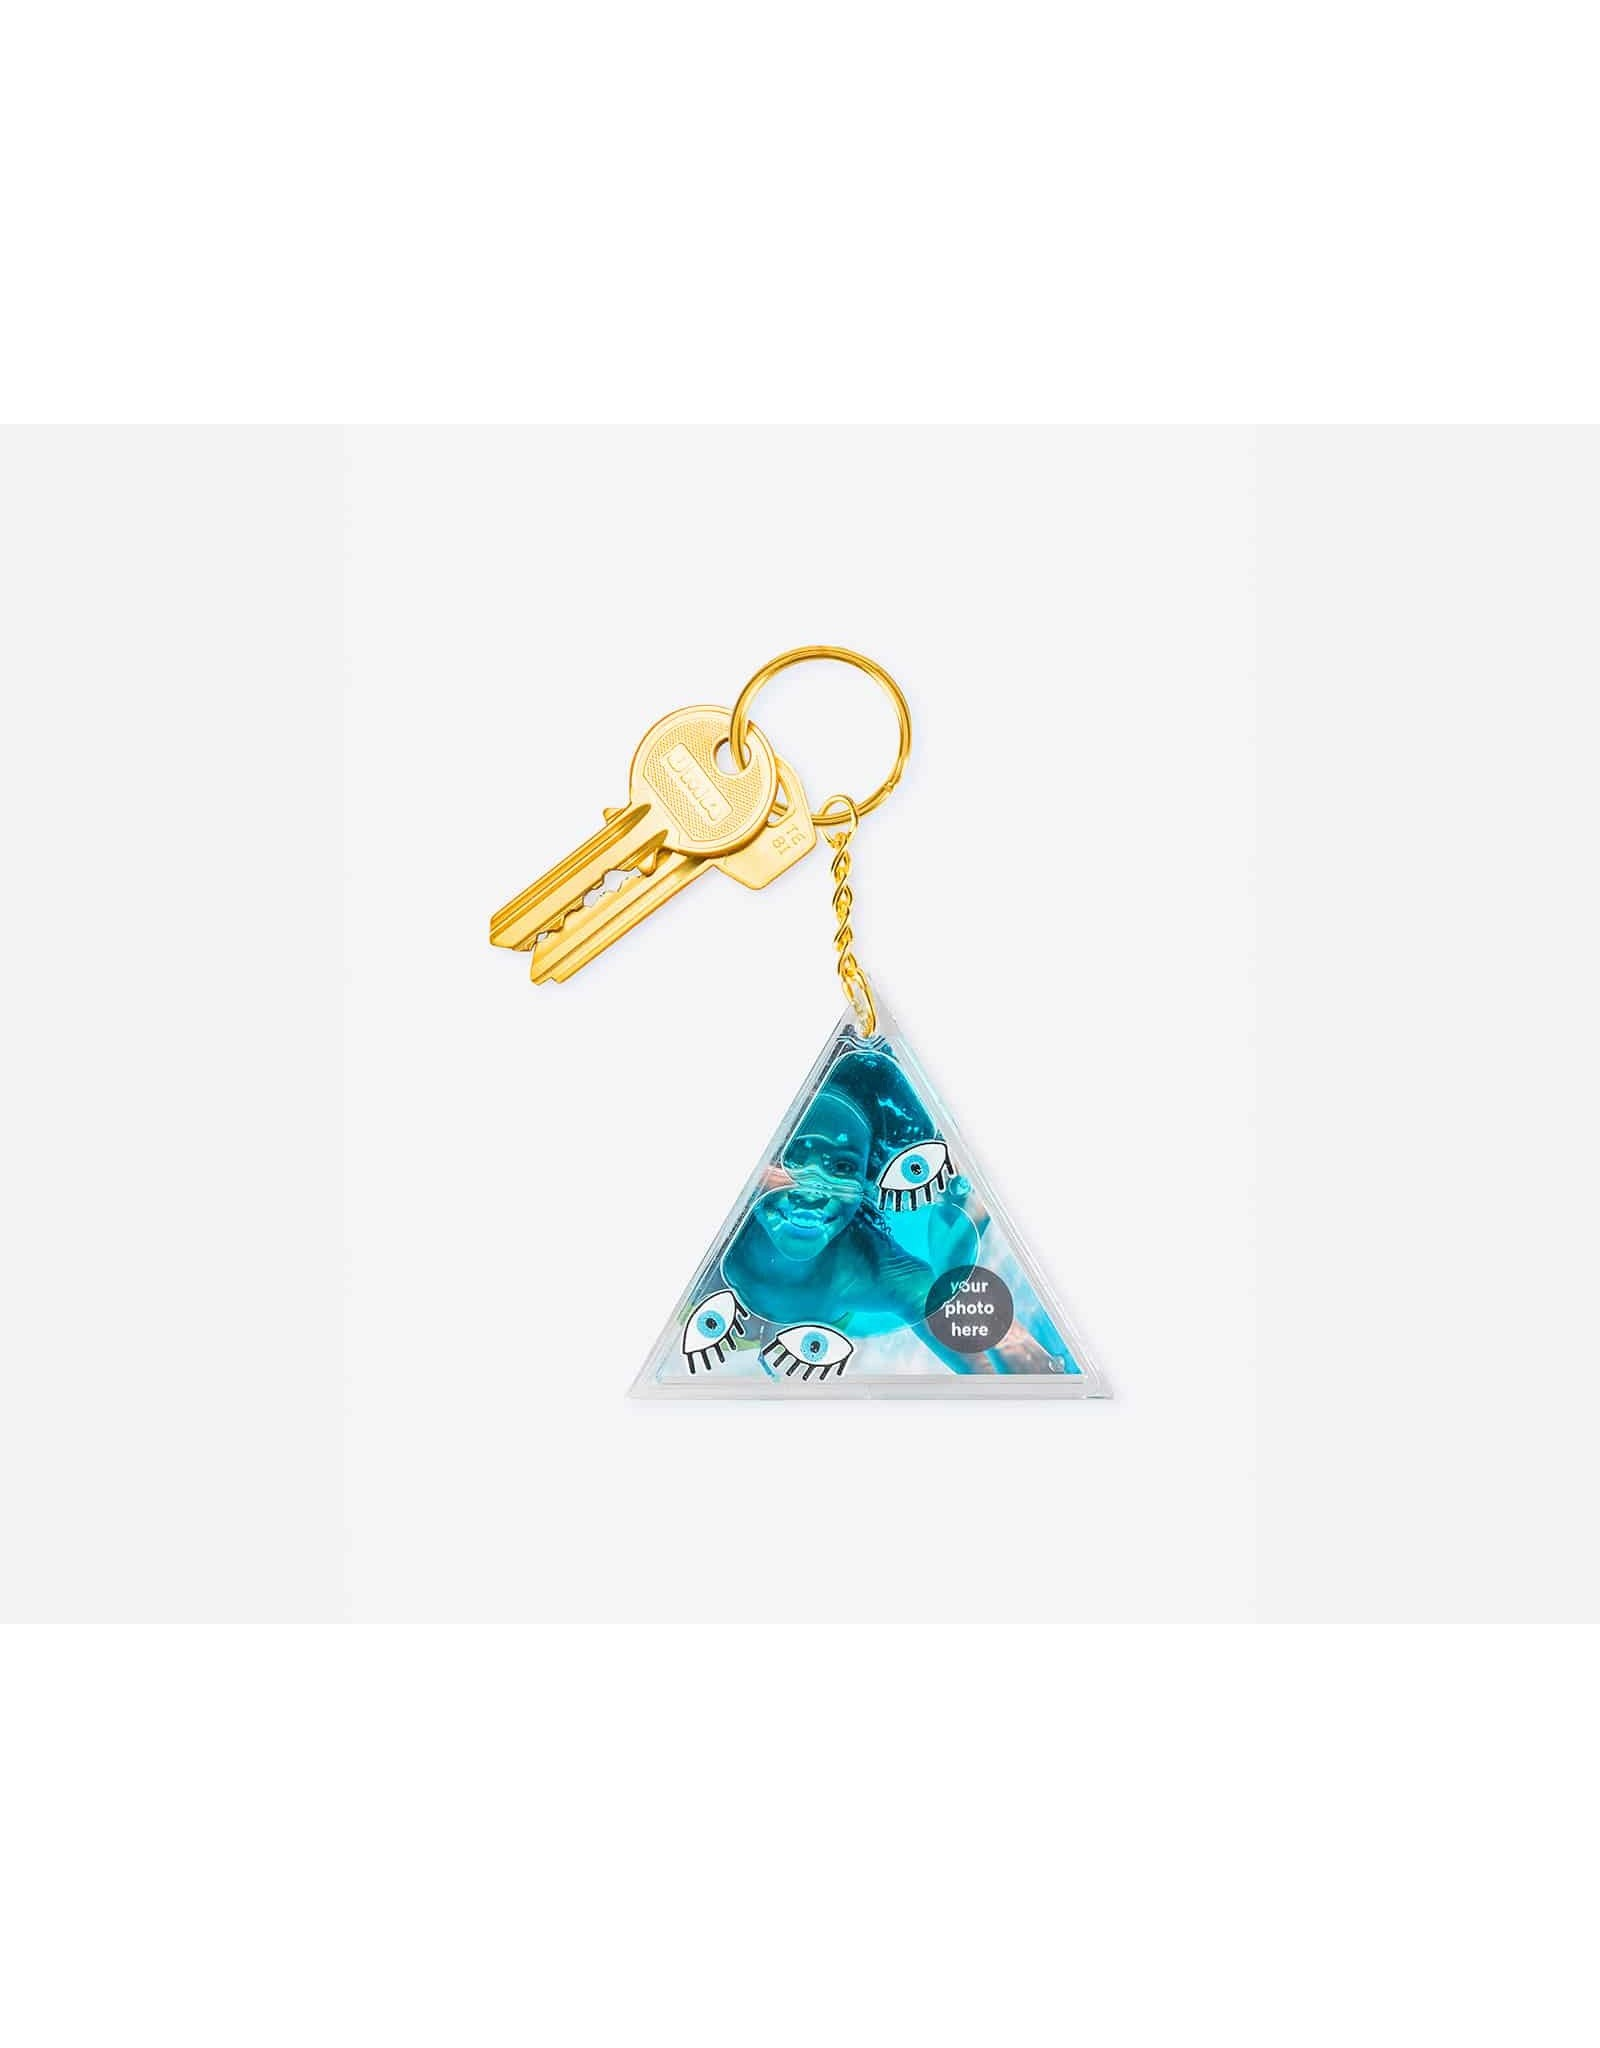 Aqua Photo Holding Keychains